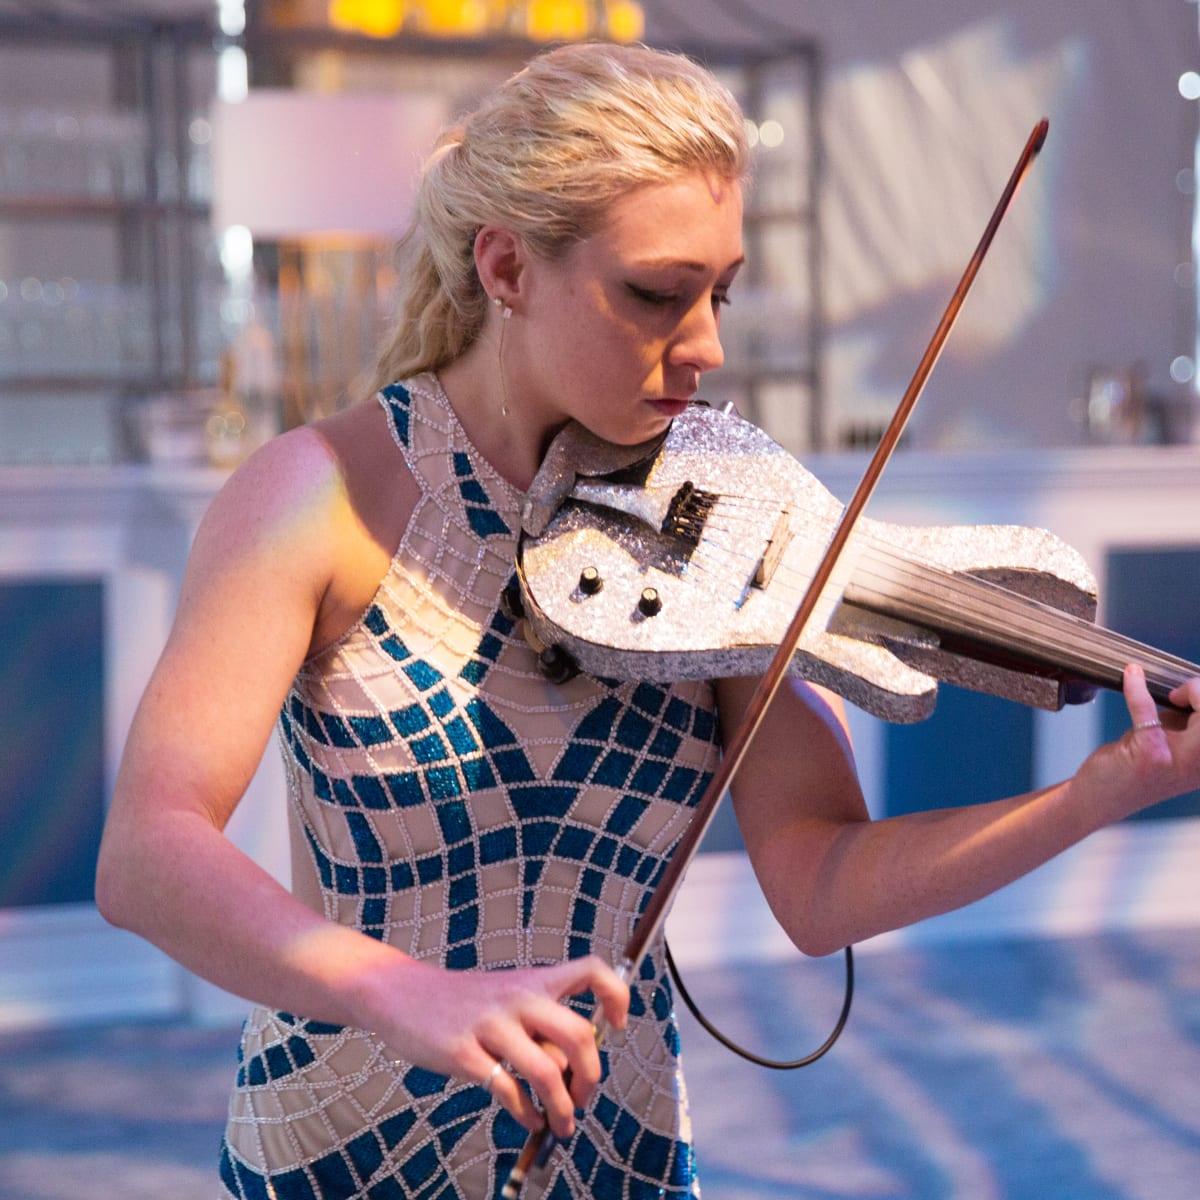 Violinist at Dallas Art Ball 2017